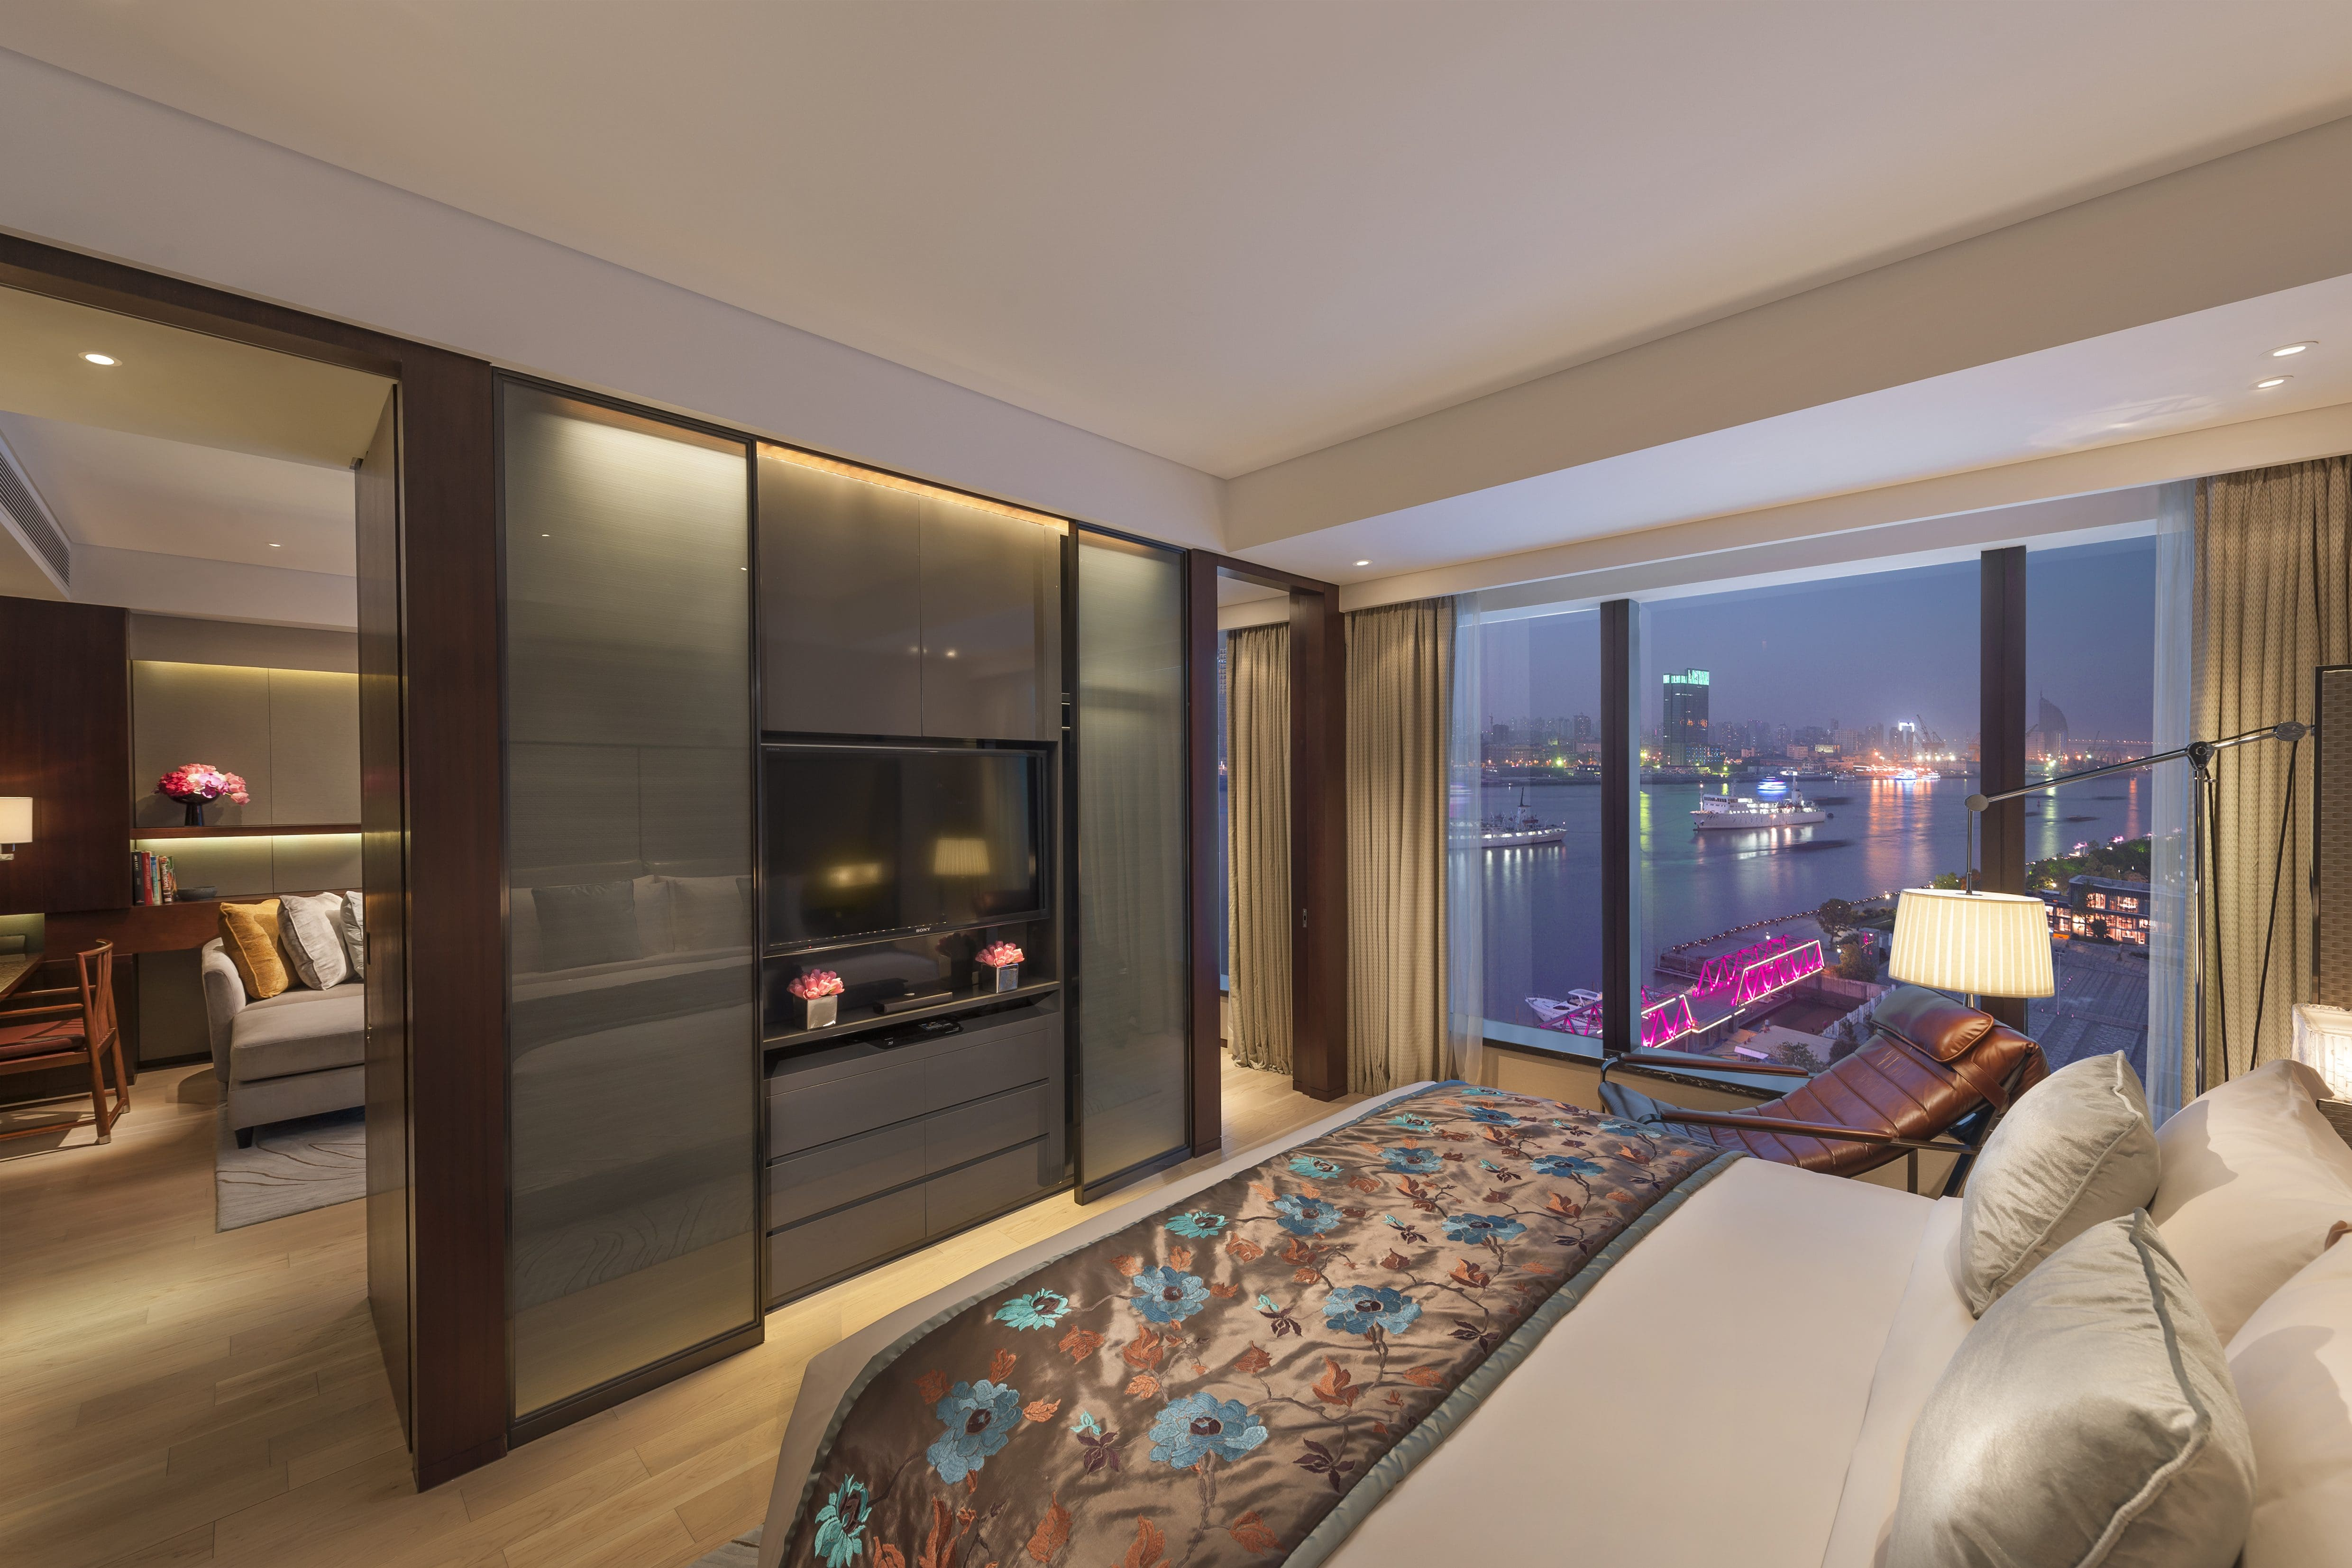 OneBedroom Apartment Luxury Apartments by Mandarin Oriental Shanghai